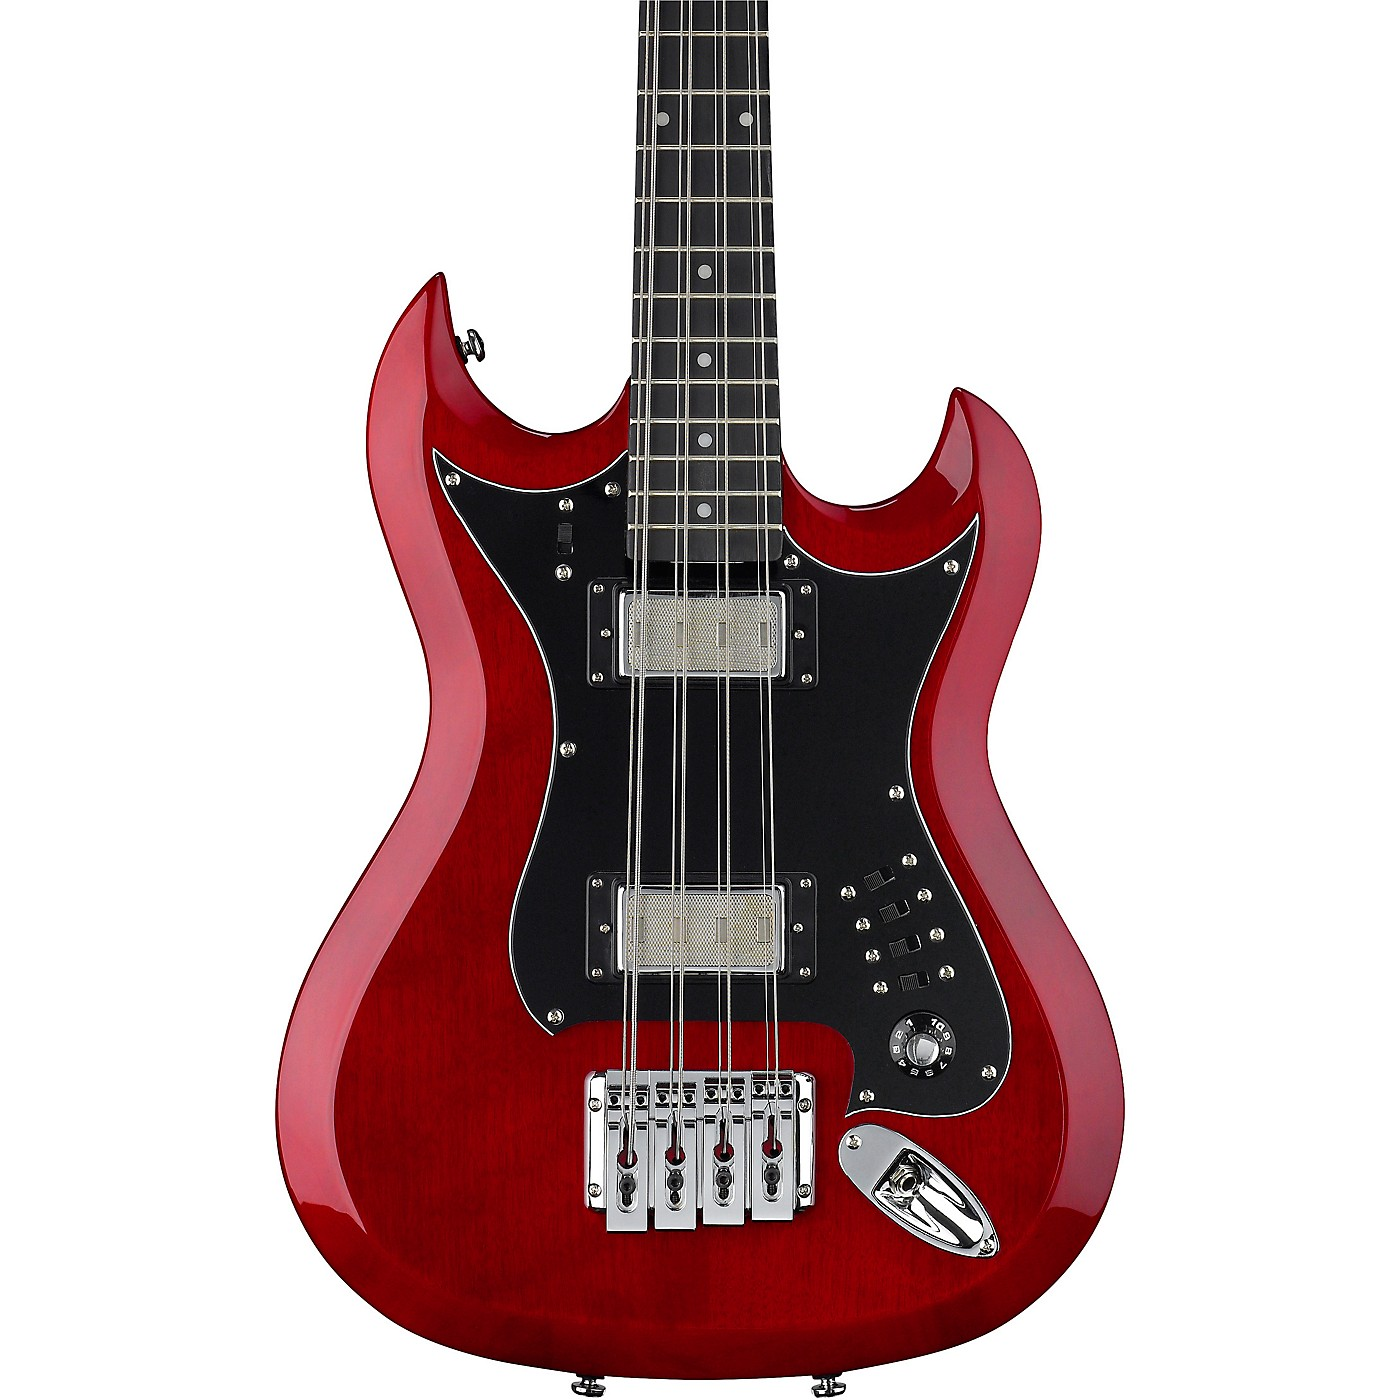 Hagstrom Retroscape H8 Reissue 8-String Electric Bass Guitar thumbnail